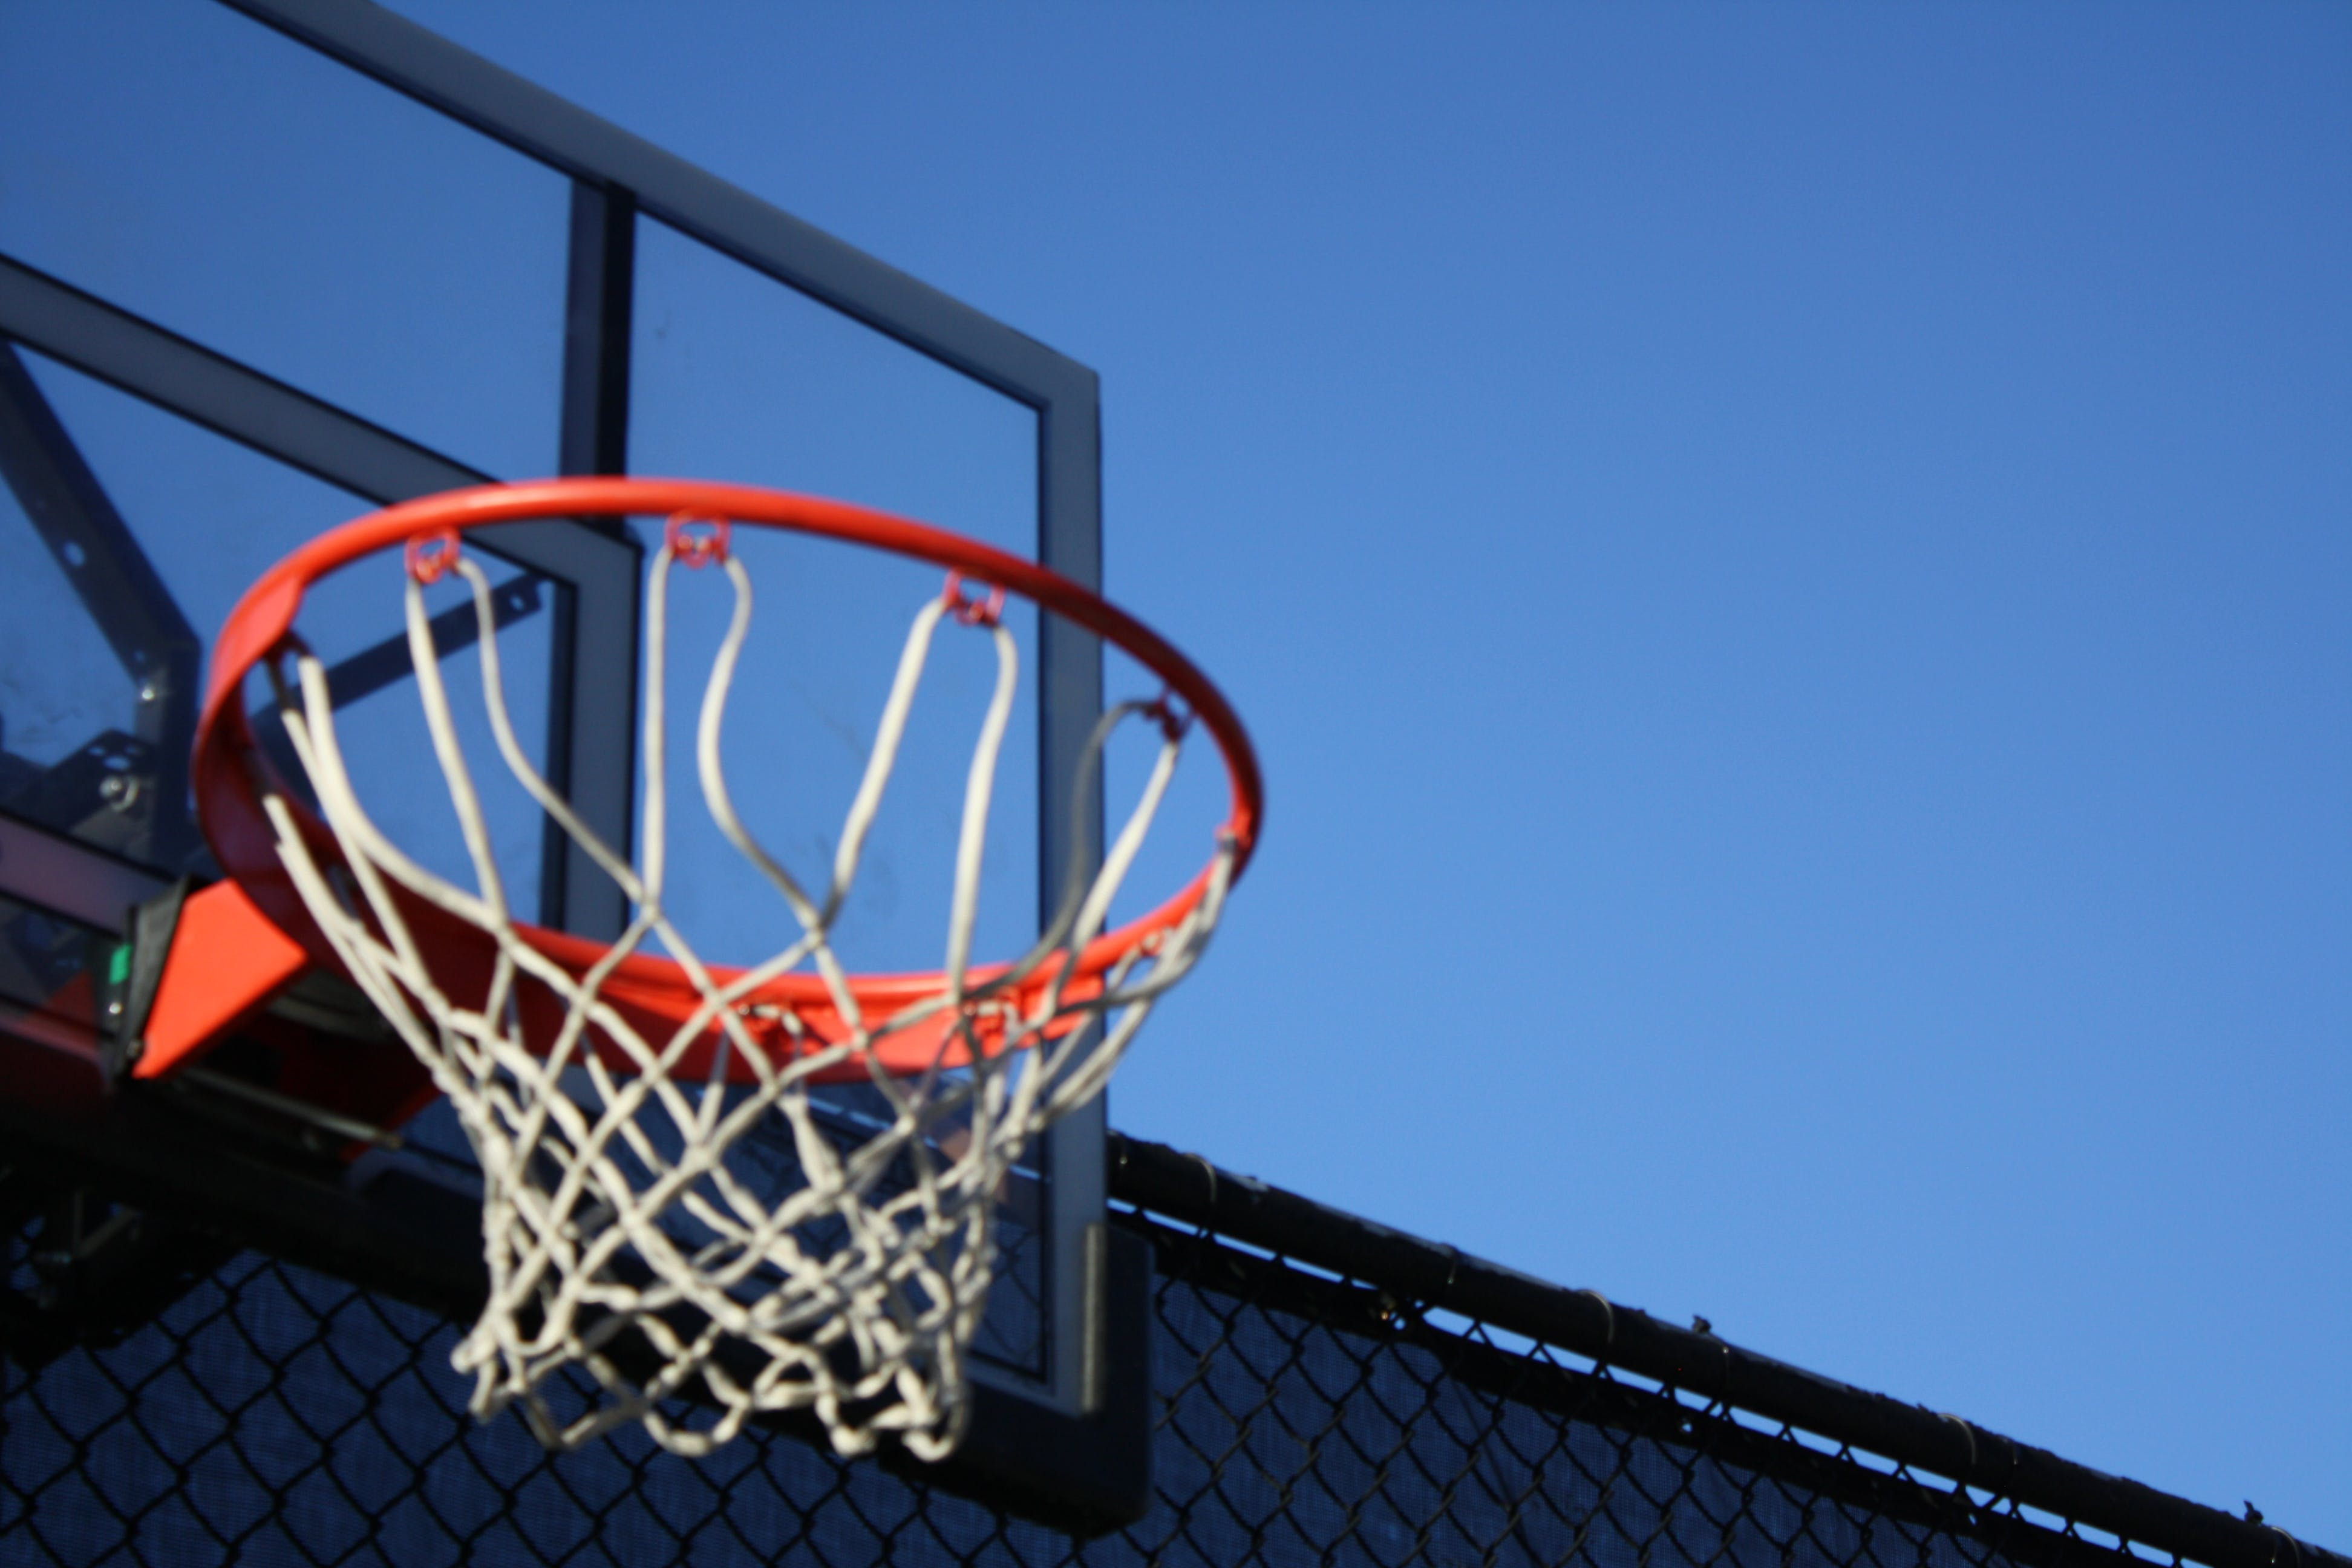 Gray Metal Frame Basketball Hoop System